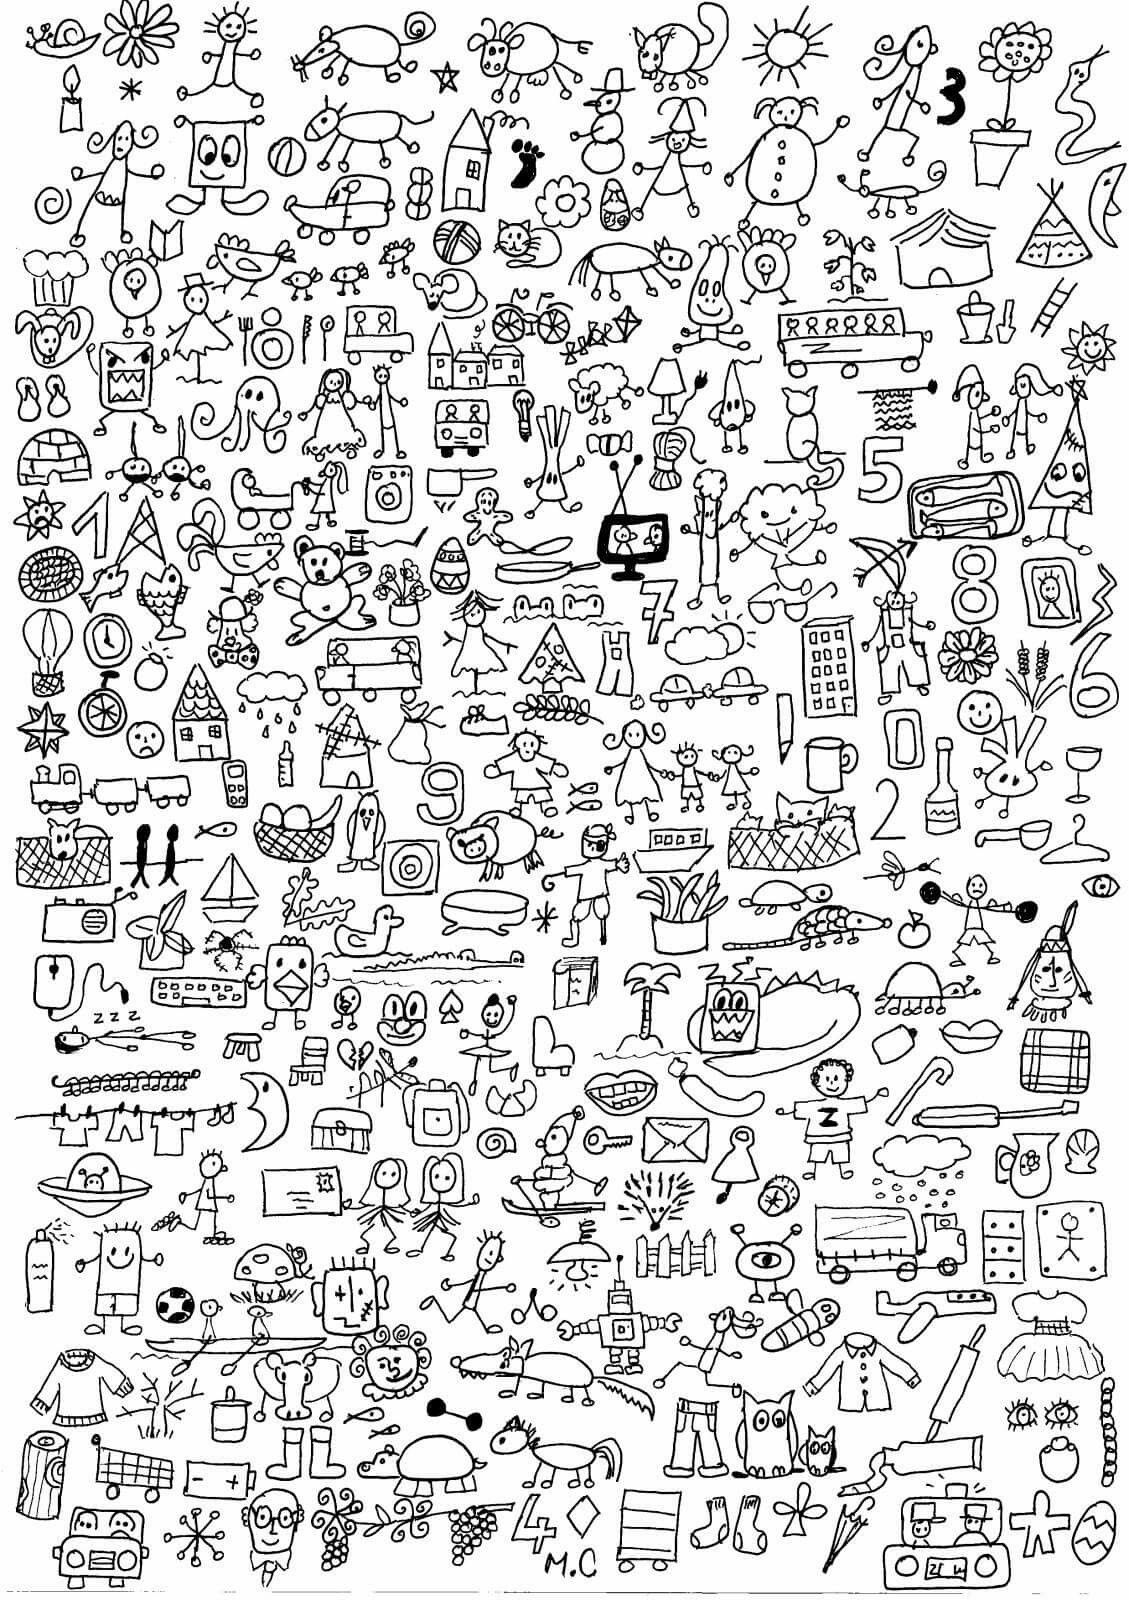 Worksheets I Spy Worksheets y visual 1 esl english as a second adhd kids